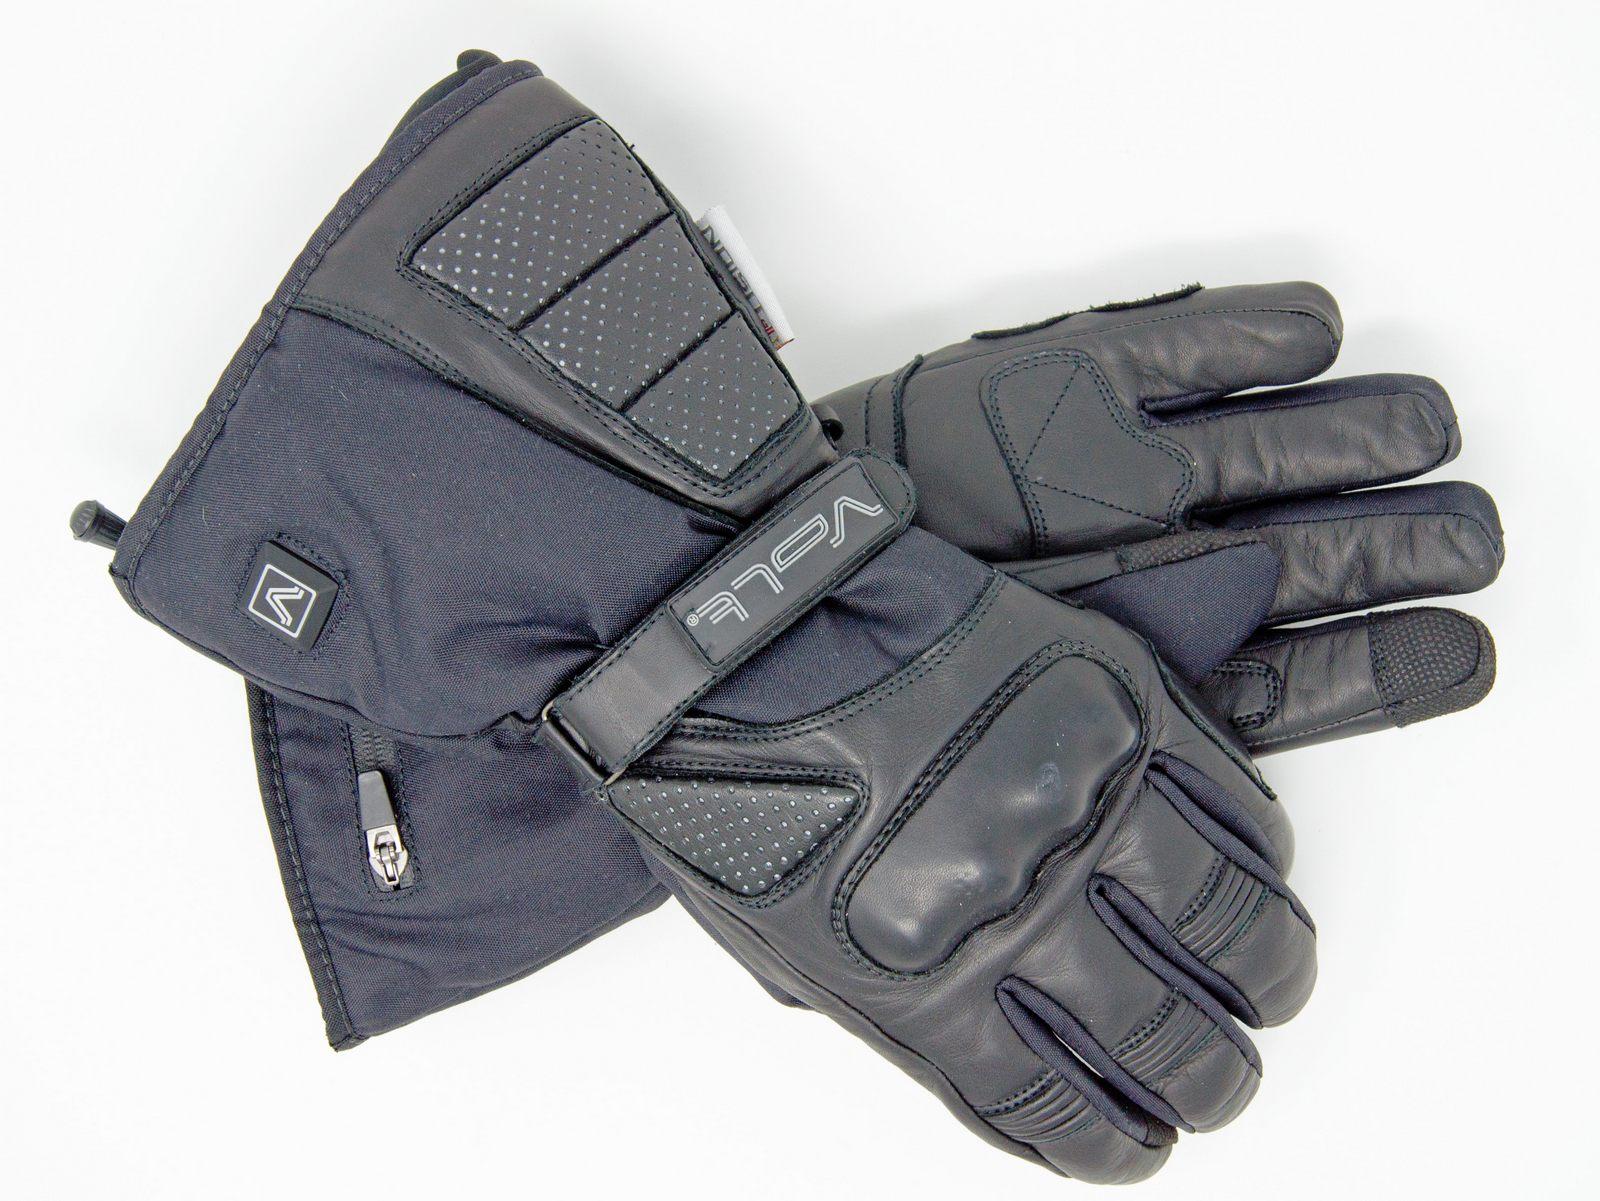 volt heat fusion gloves top view